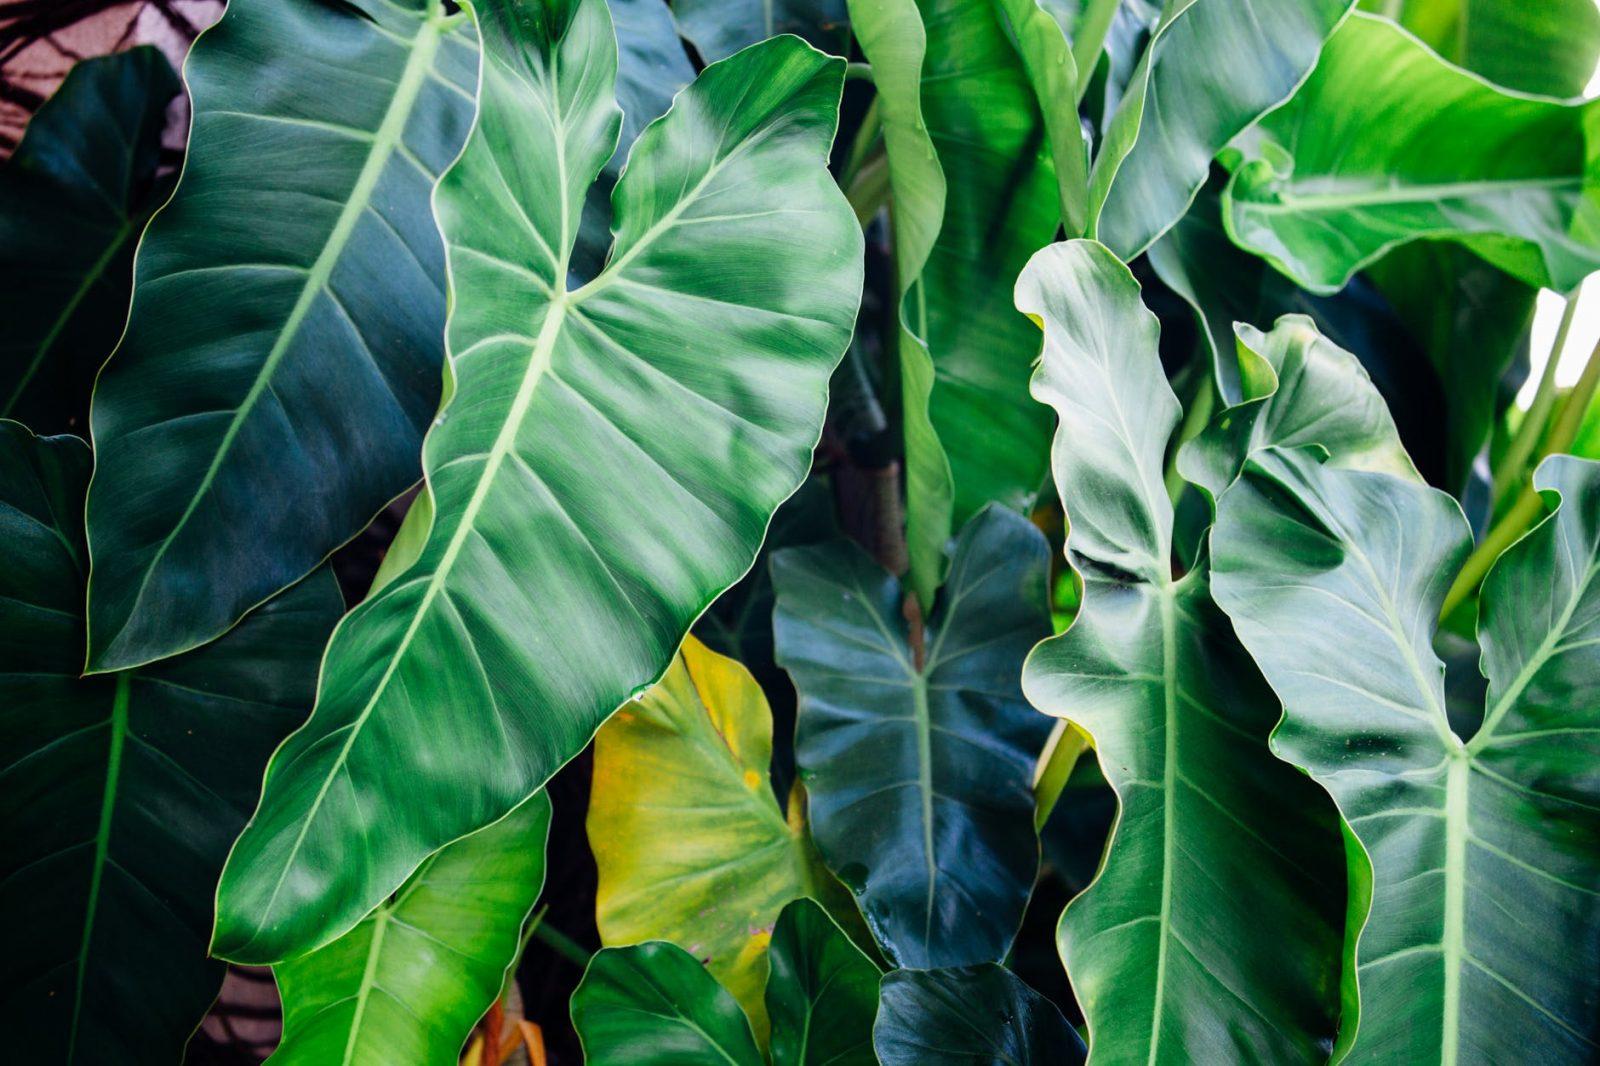 close up photo of taro plant